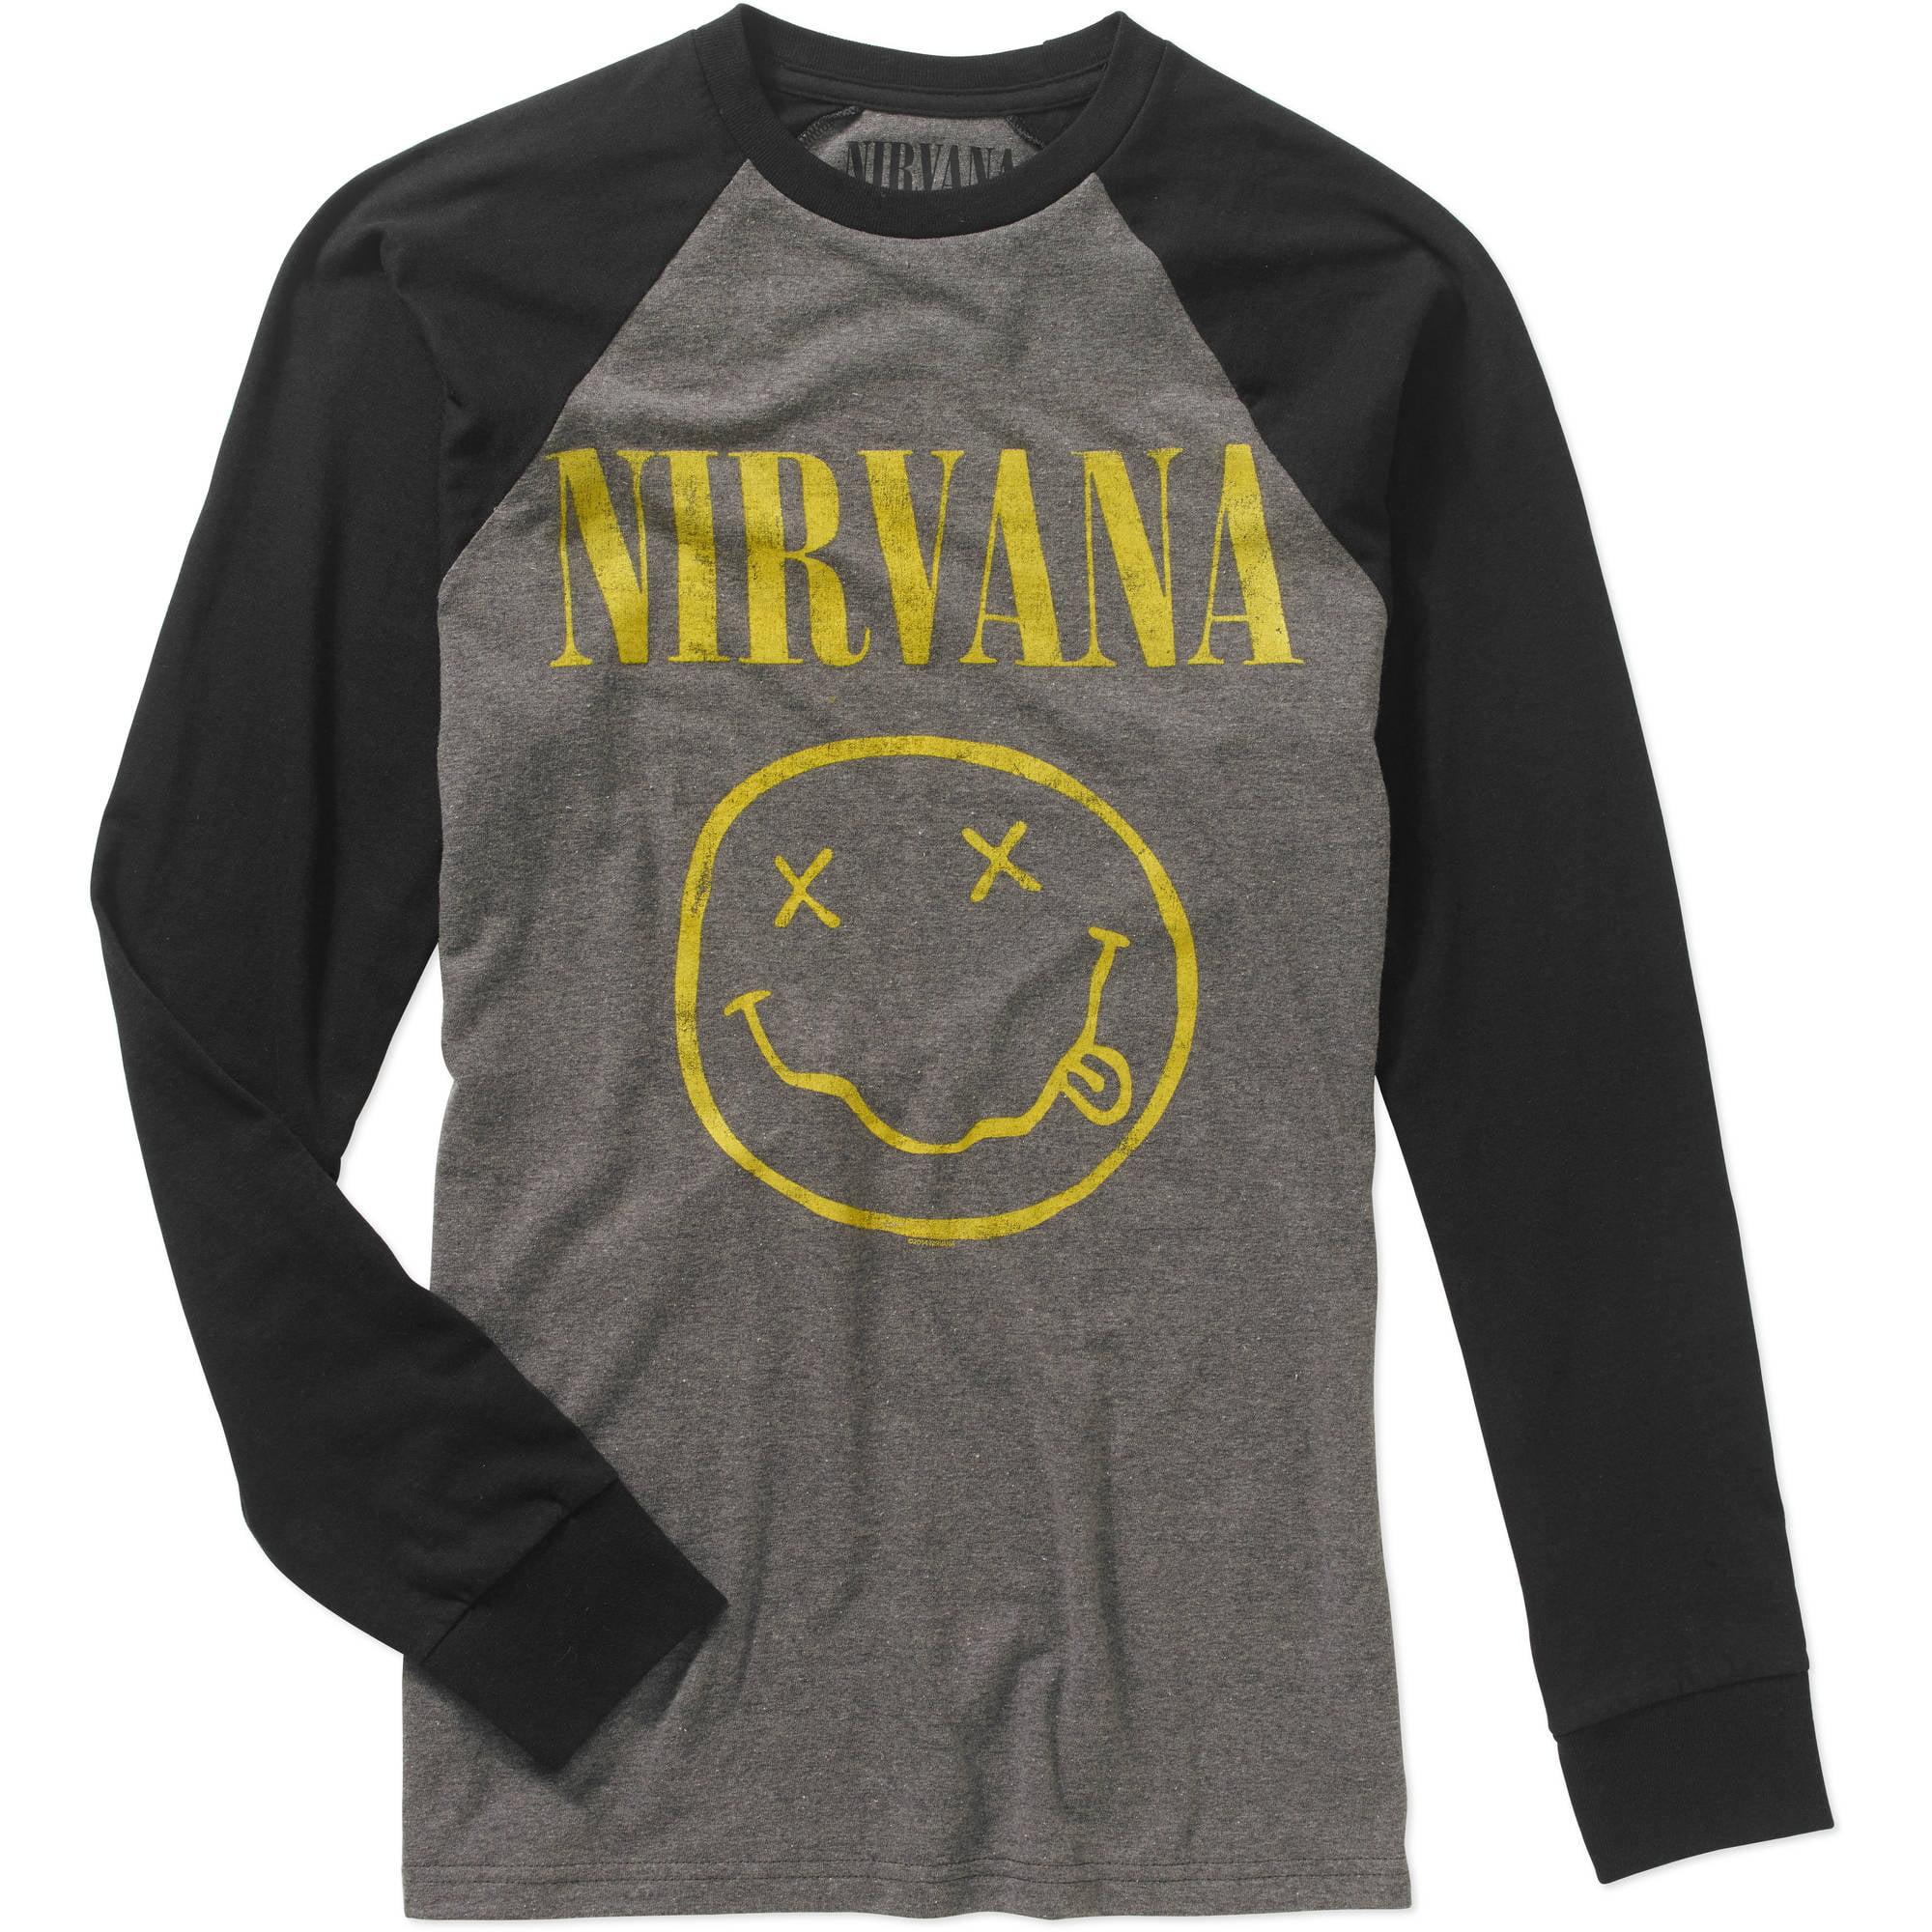 Black t shirt at walmart - Black T Shirt At Walmart 36